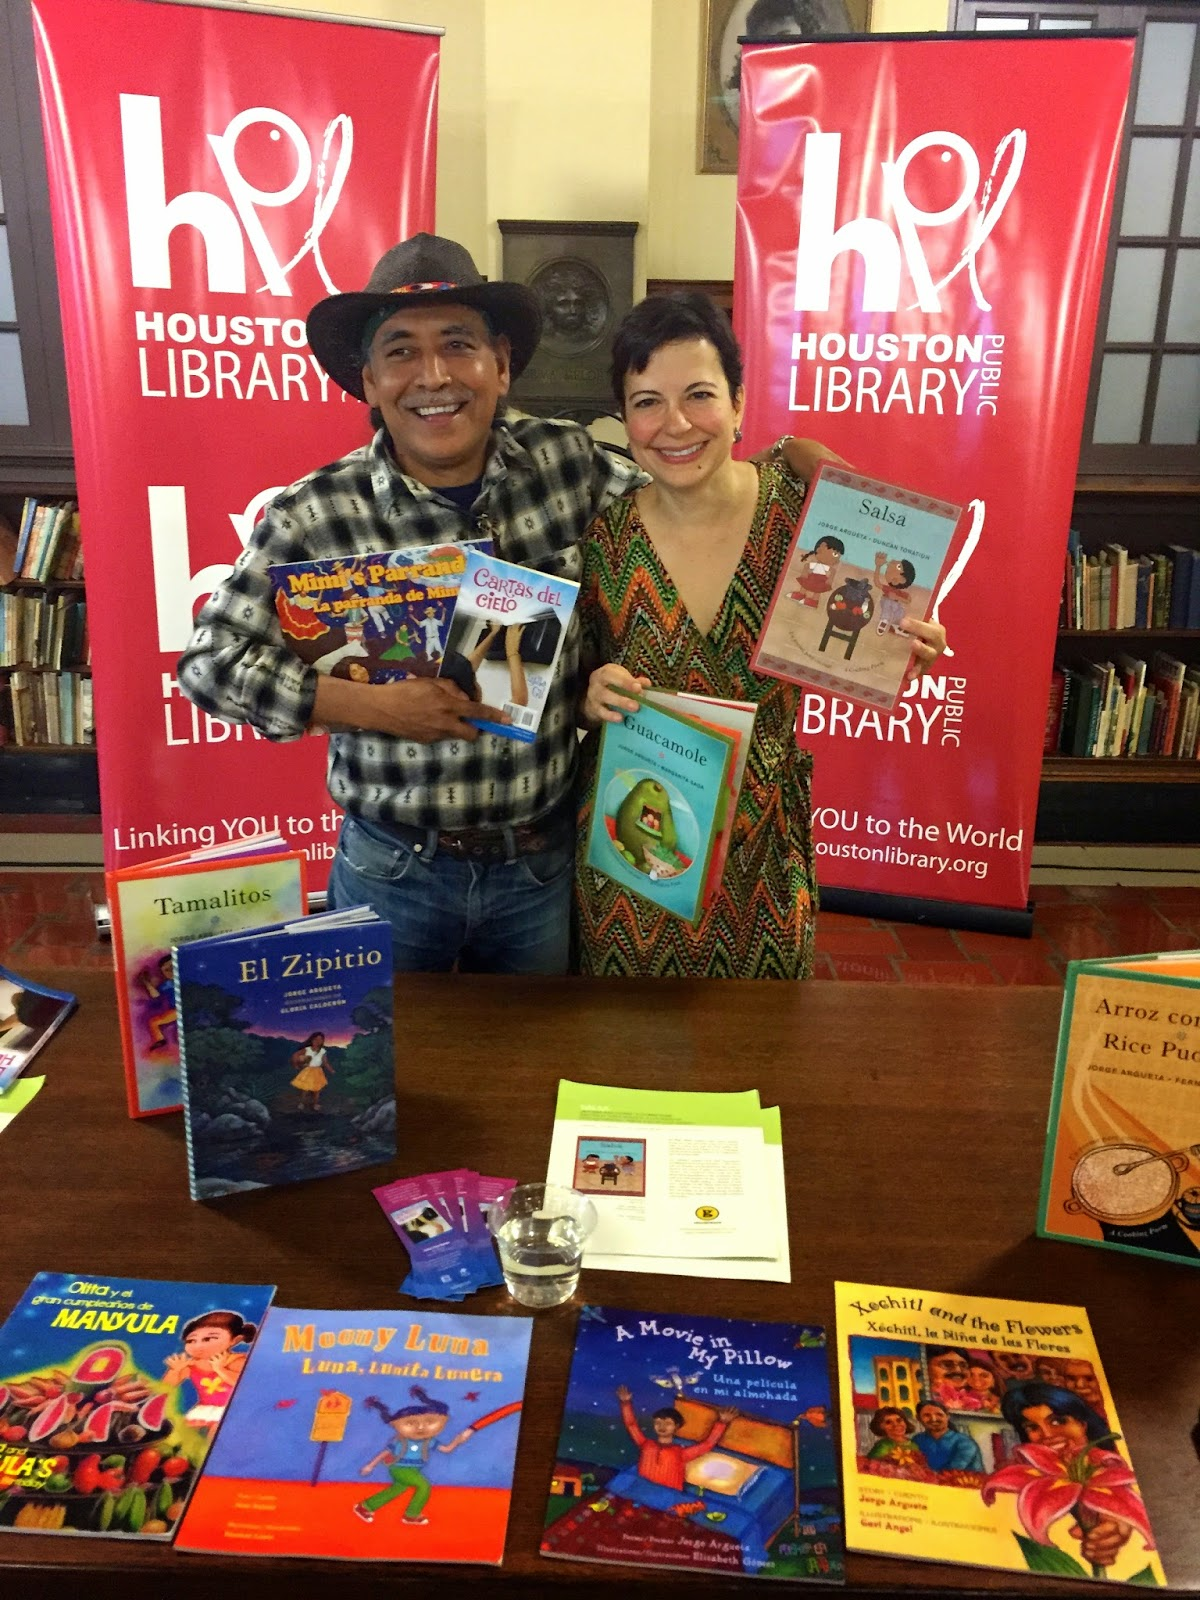 la bloga d iacute a in houston 2015 international latino book awards the international latino book awards setting a high cultural standard